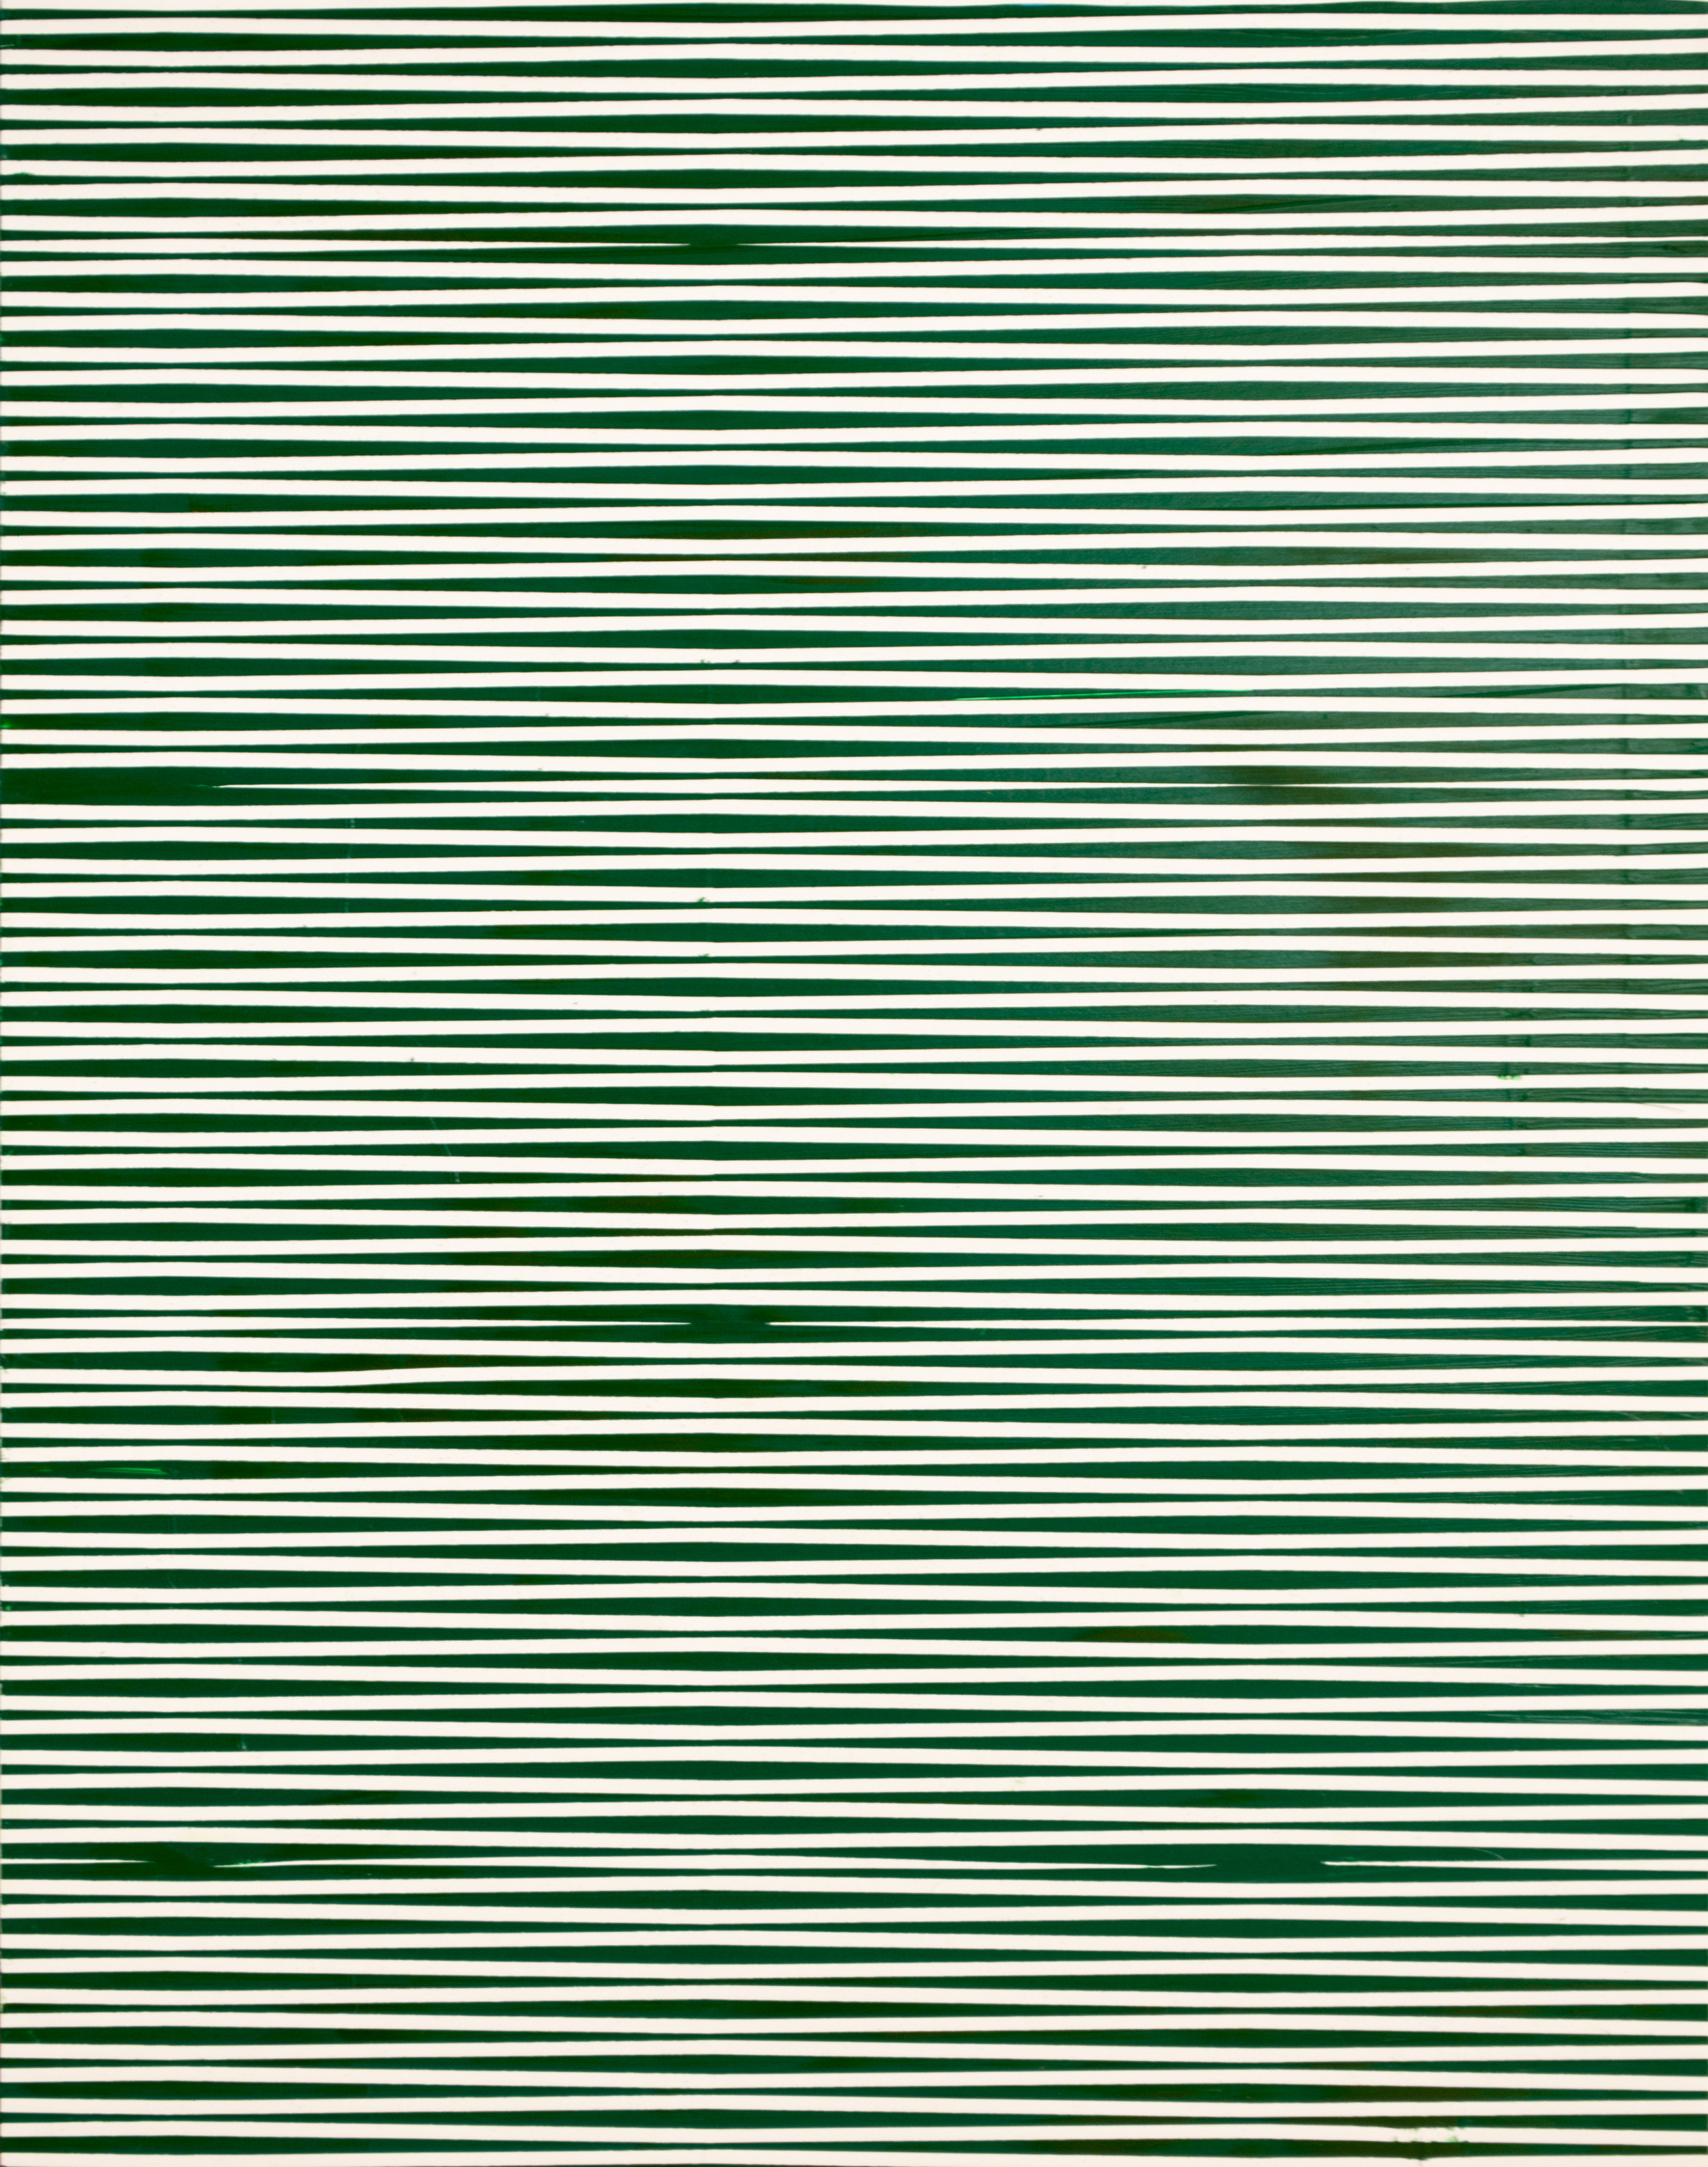 HUE Gallery of Contemporary Art - Sean Christopher Ward - Optics in Motion - Acrylic on MDF - 11x14 - 2018 - $300.jpg